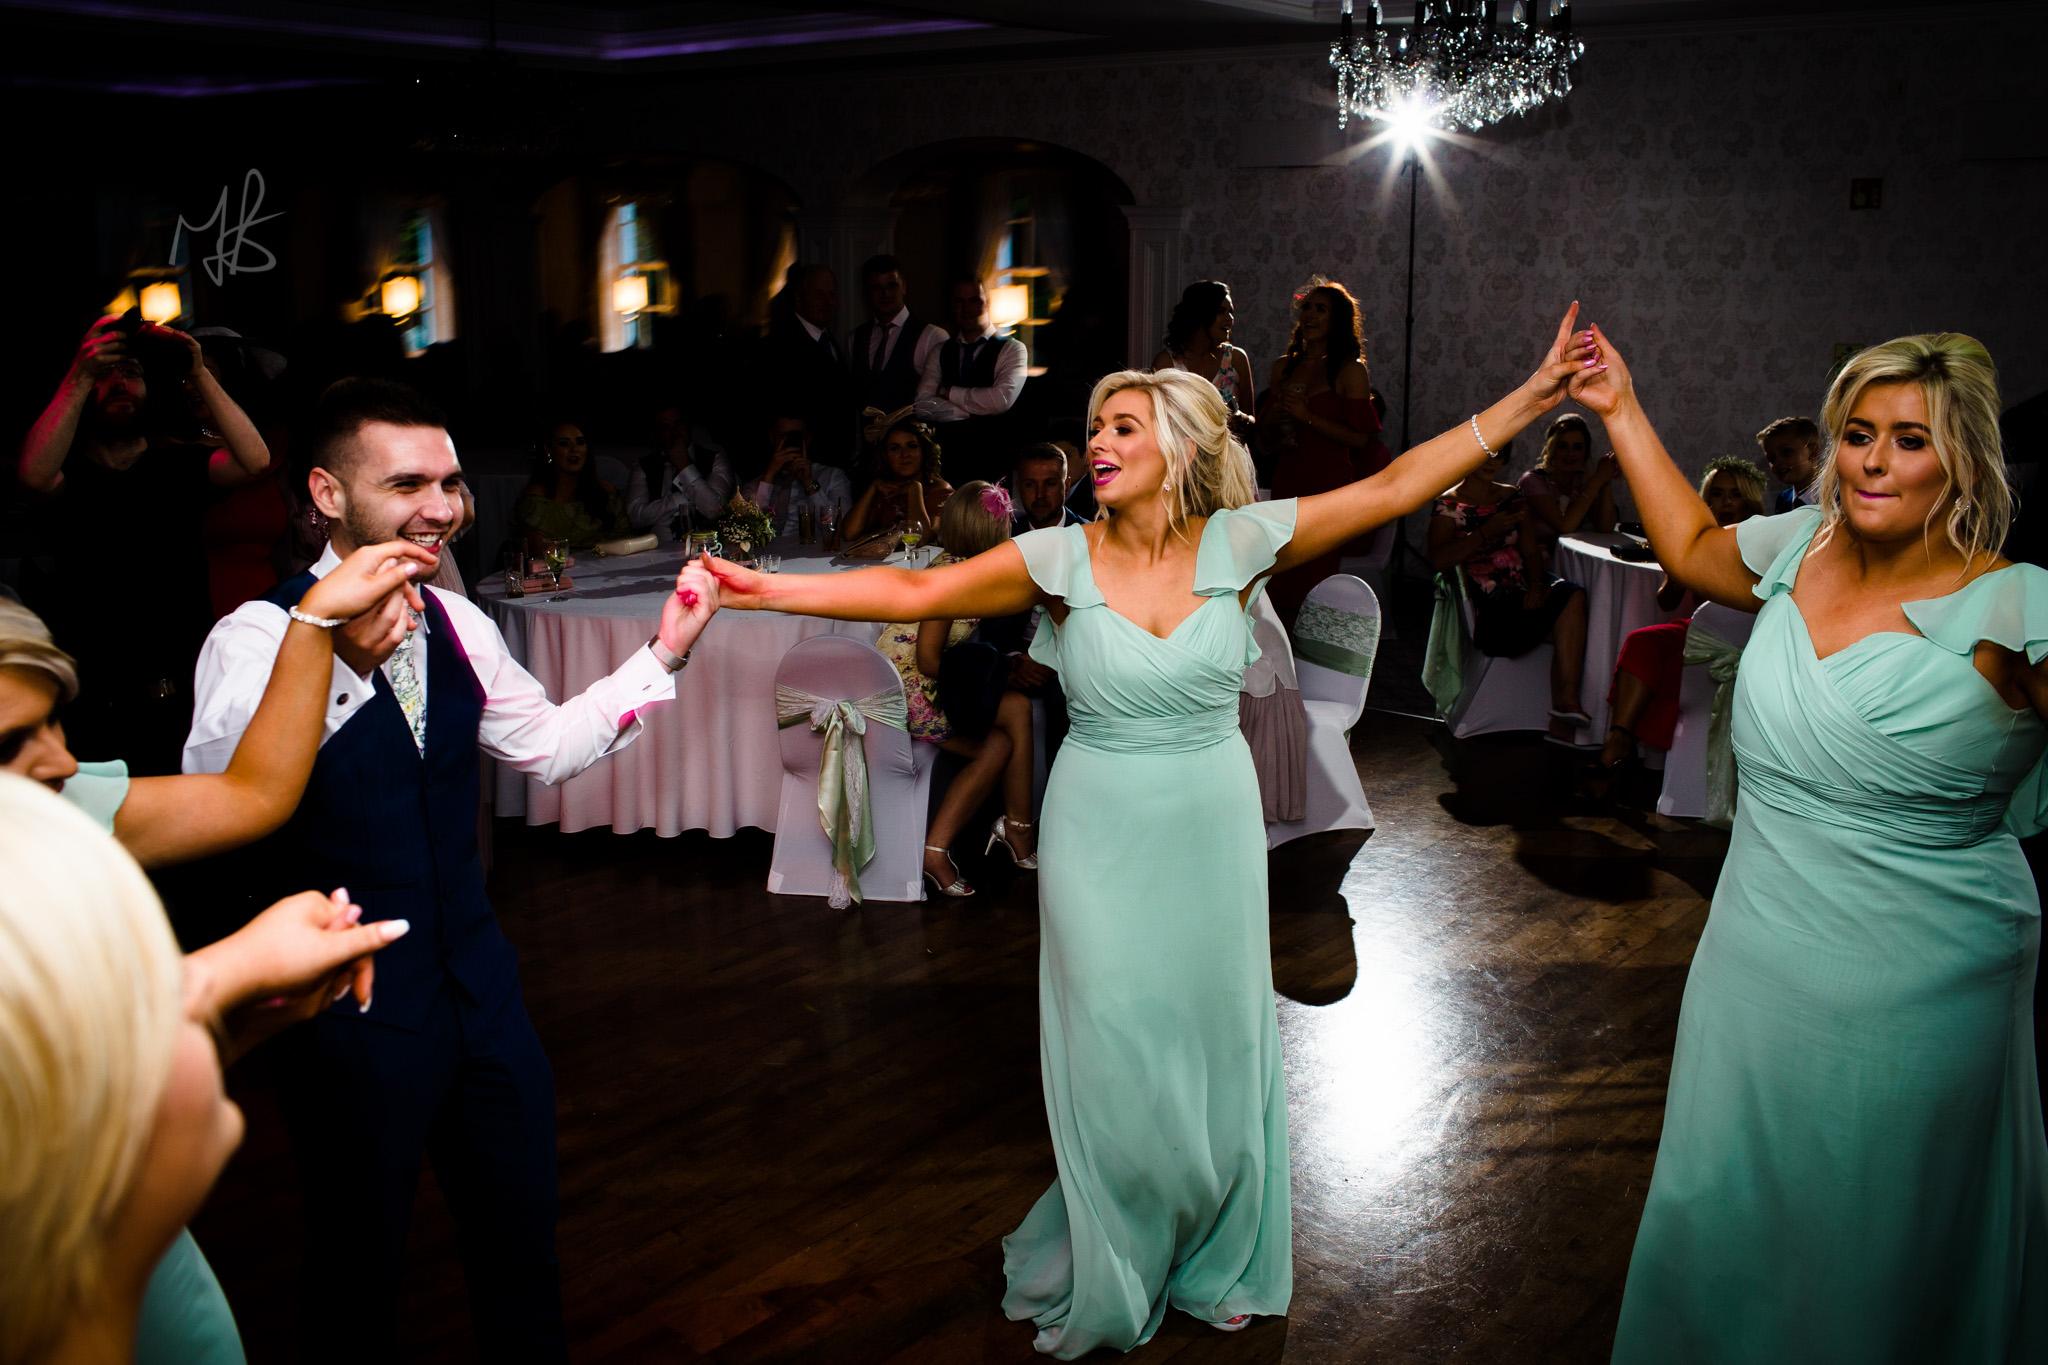 Northern-Ireland-Wedding-Photographer-Mark-Barnes-Ballymena_wedding-photography-Leighinmohr-House-Seamas_Alanna_For-web-56.jpg